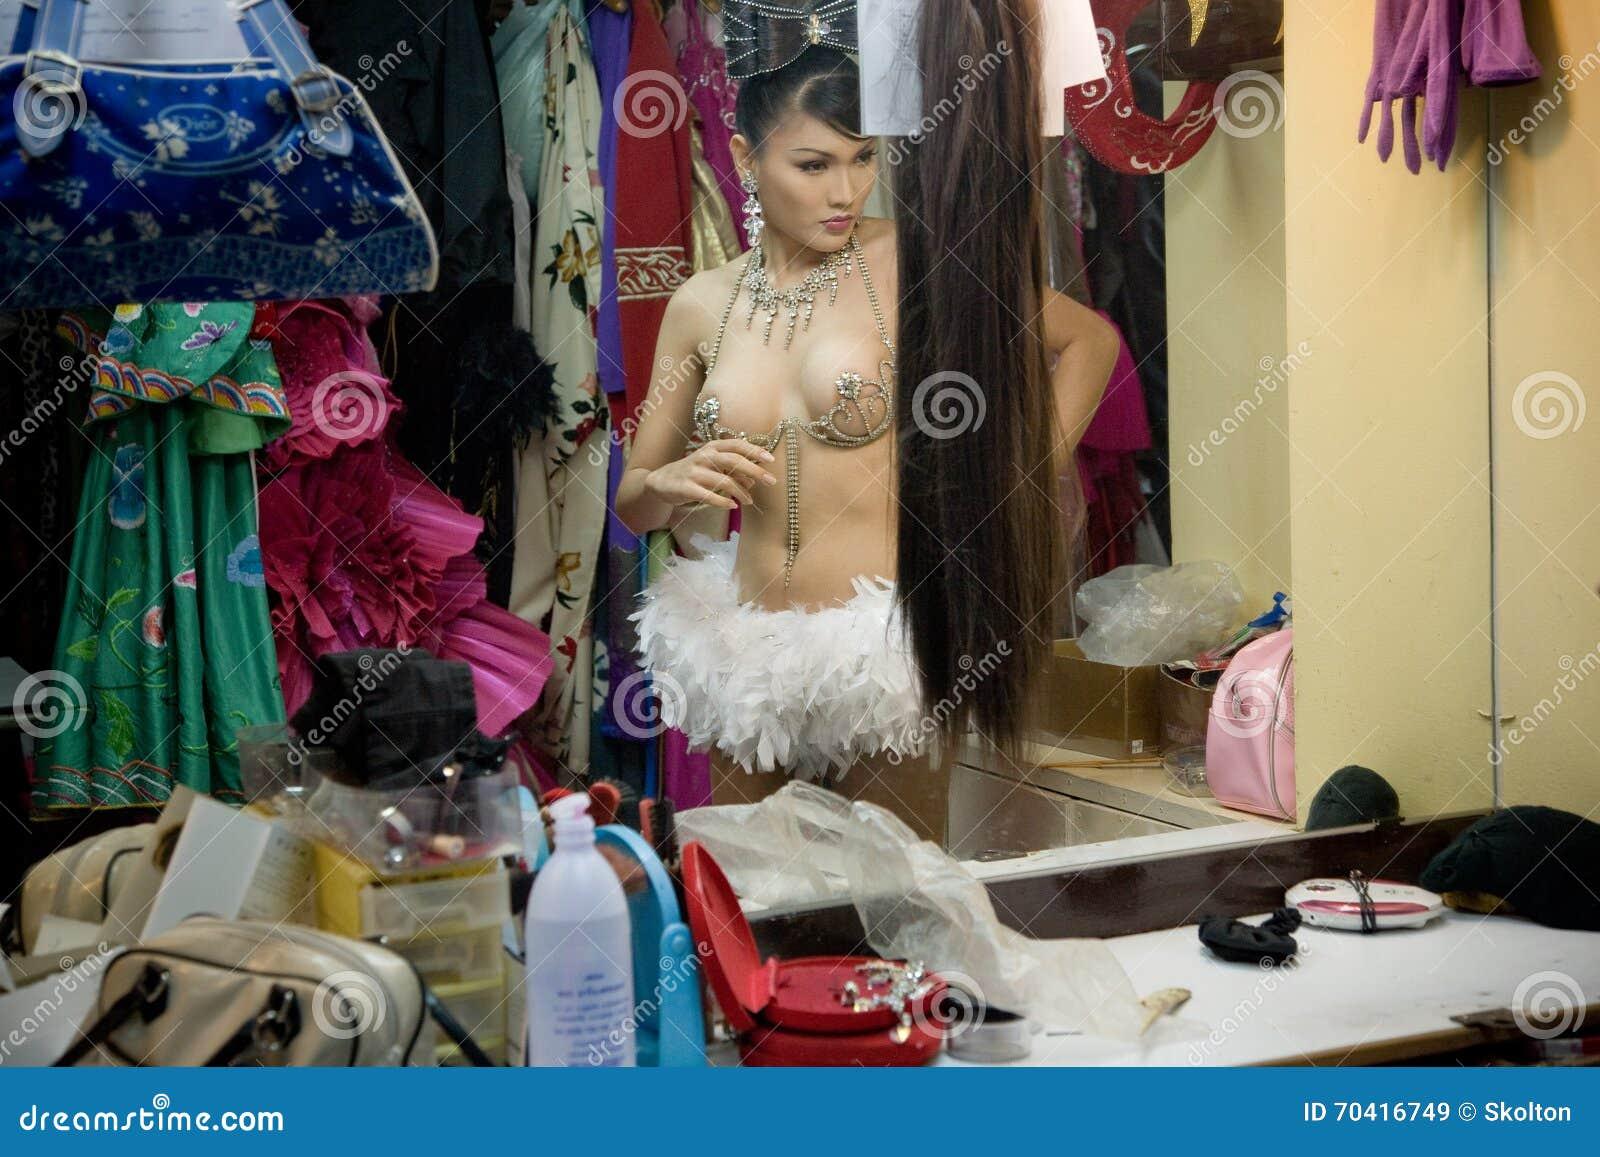 transgender hormone pics